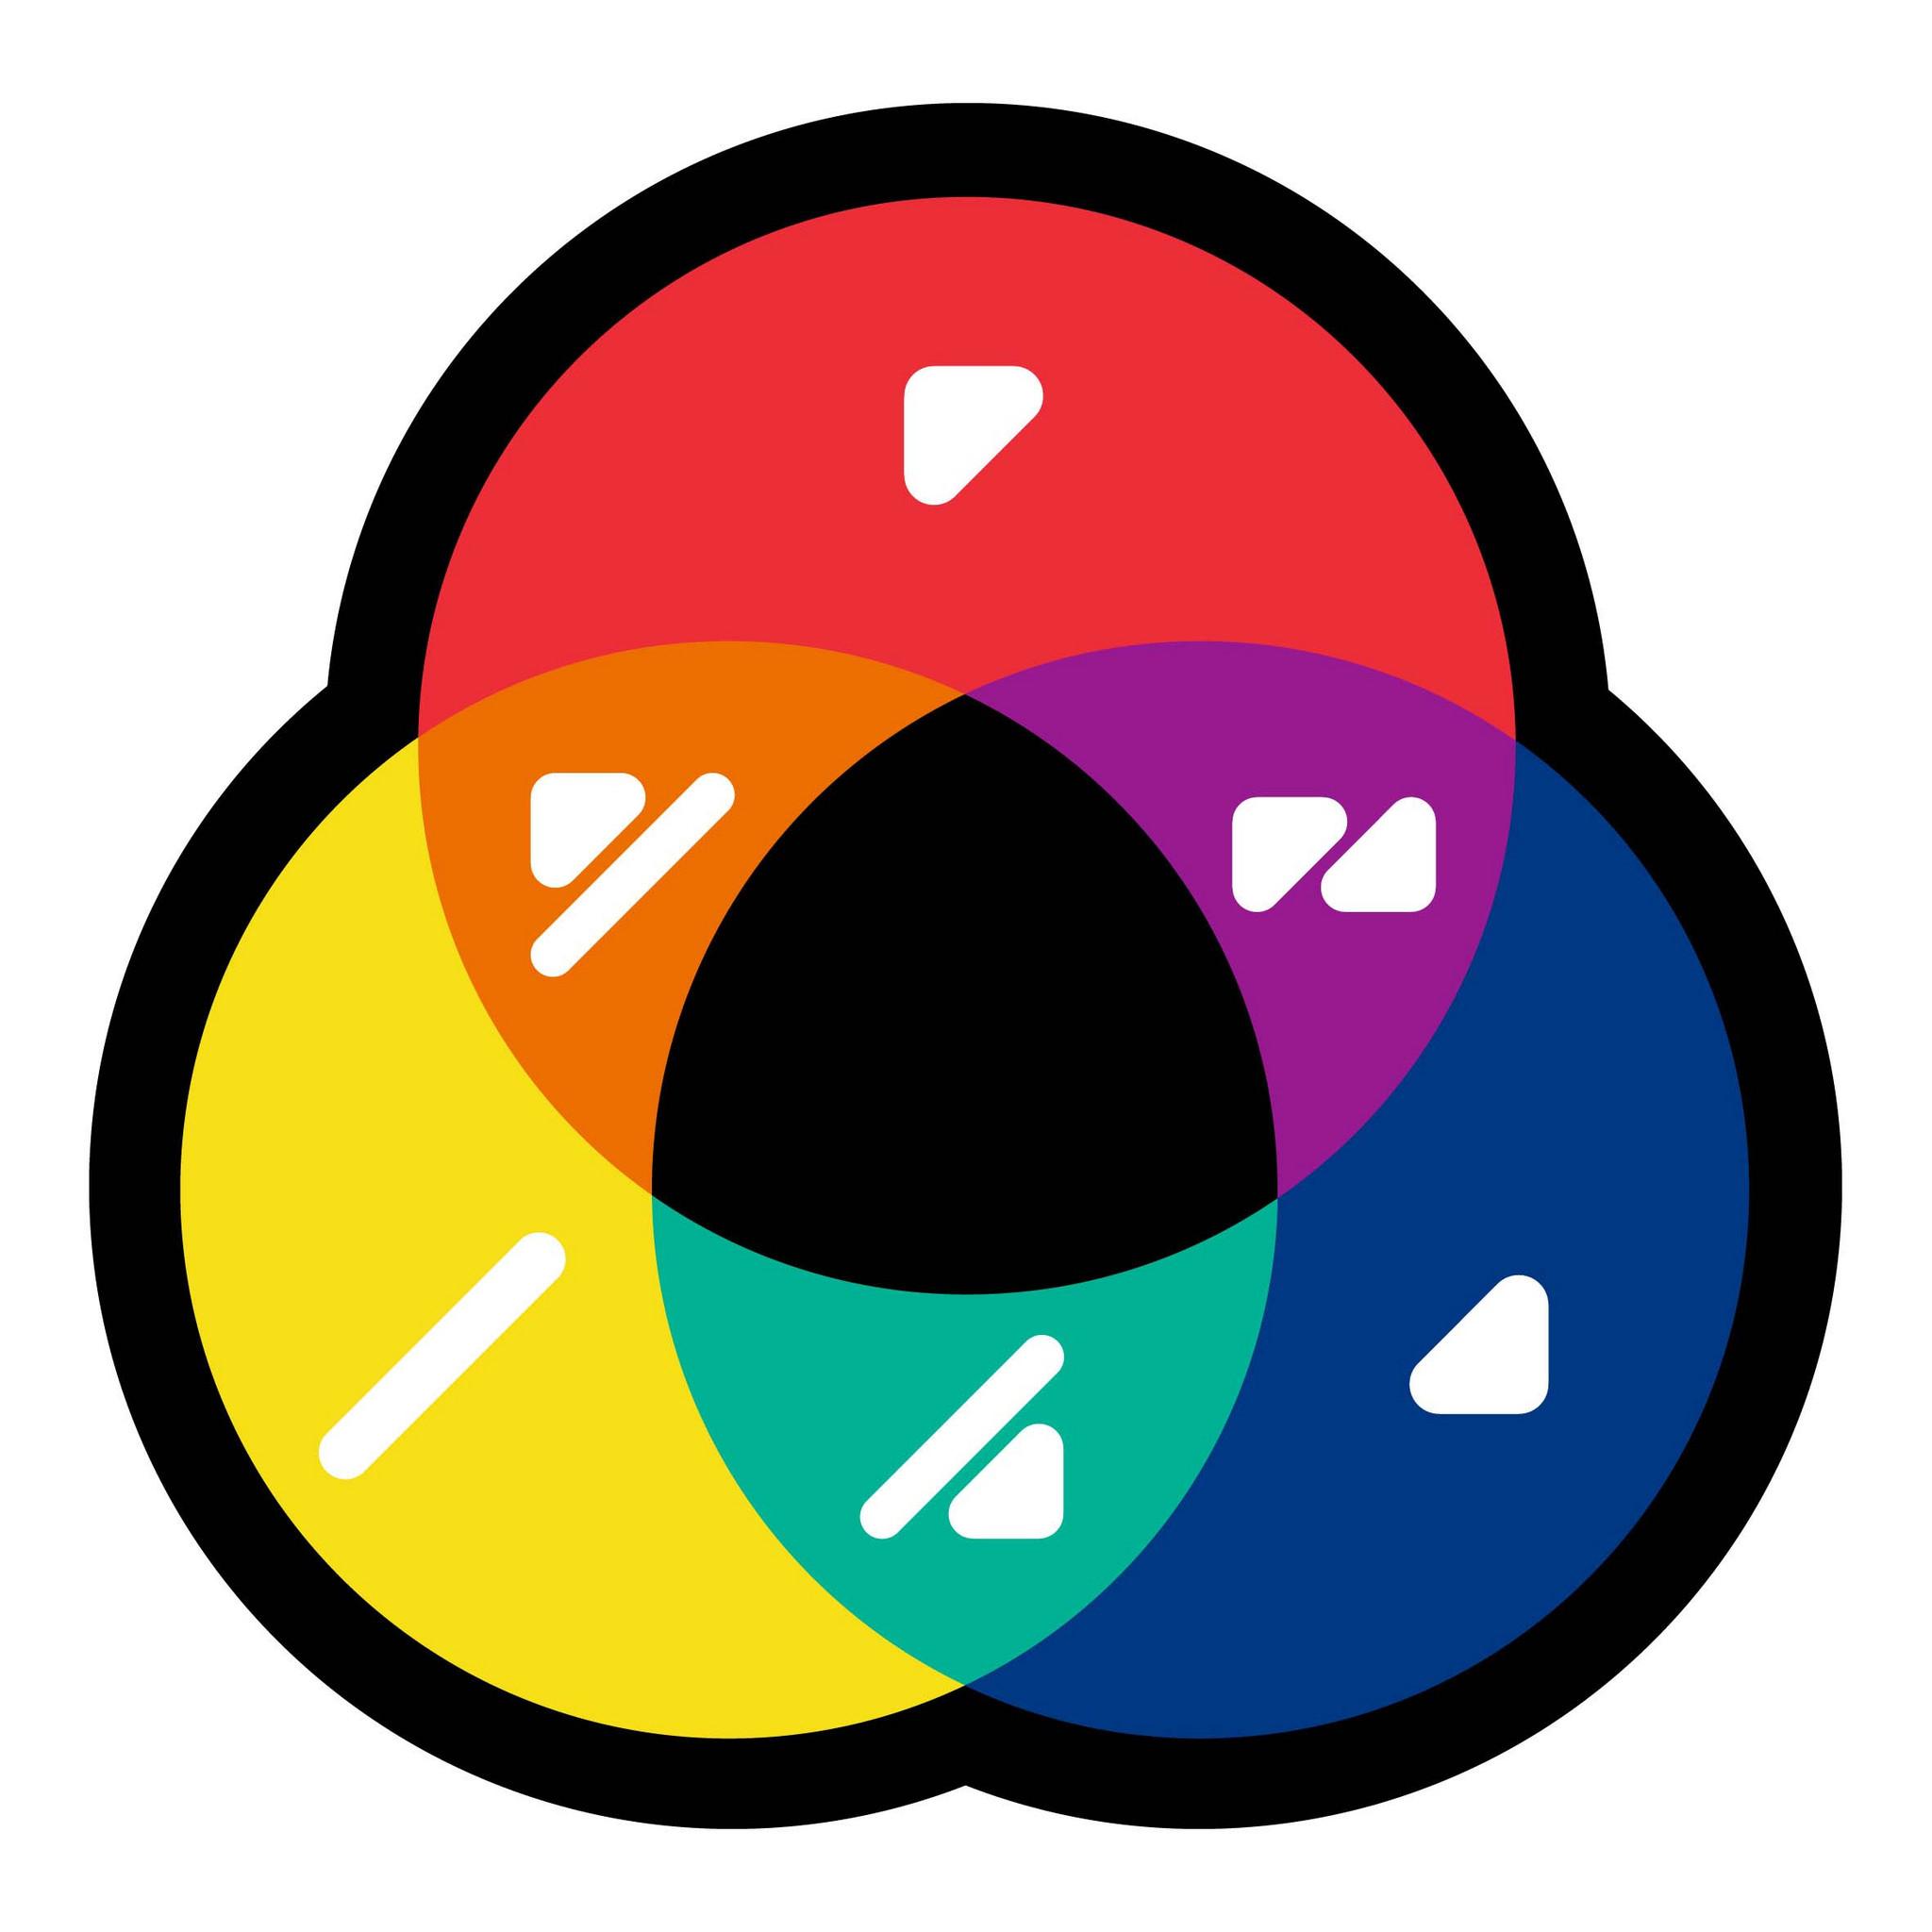 coloradd.jpg